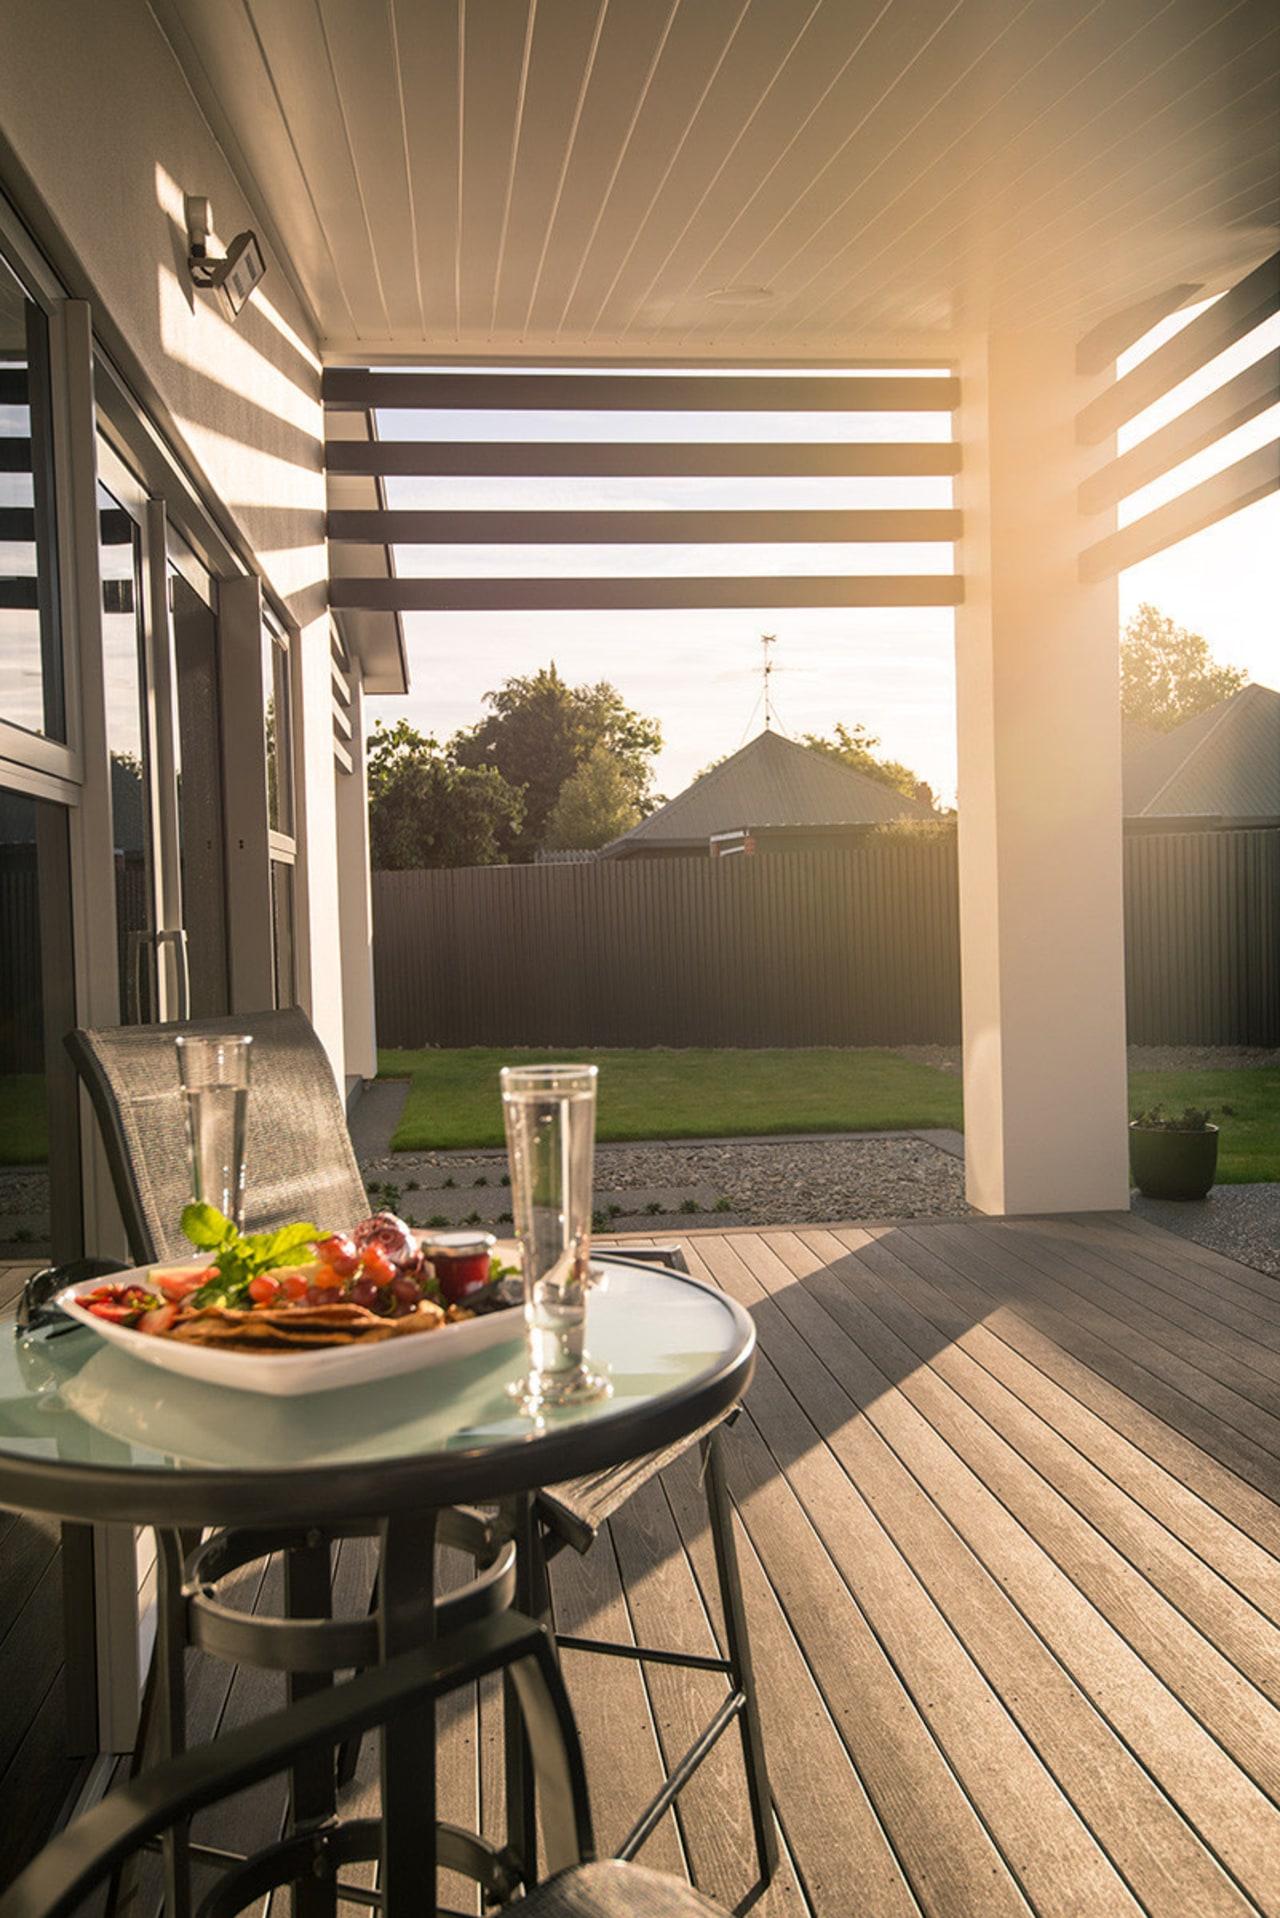 Evening on a TimberTech Terrain deck backyard, deck, home, house, interior design, outdoor structure, patio, porch, real estate, table, window, brown, orange